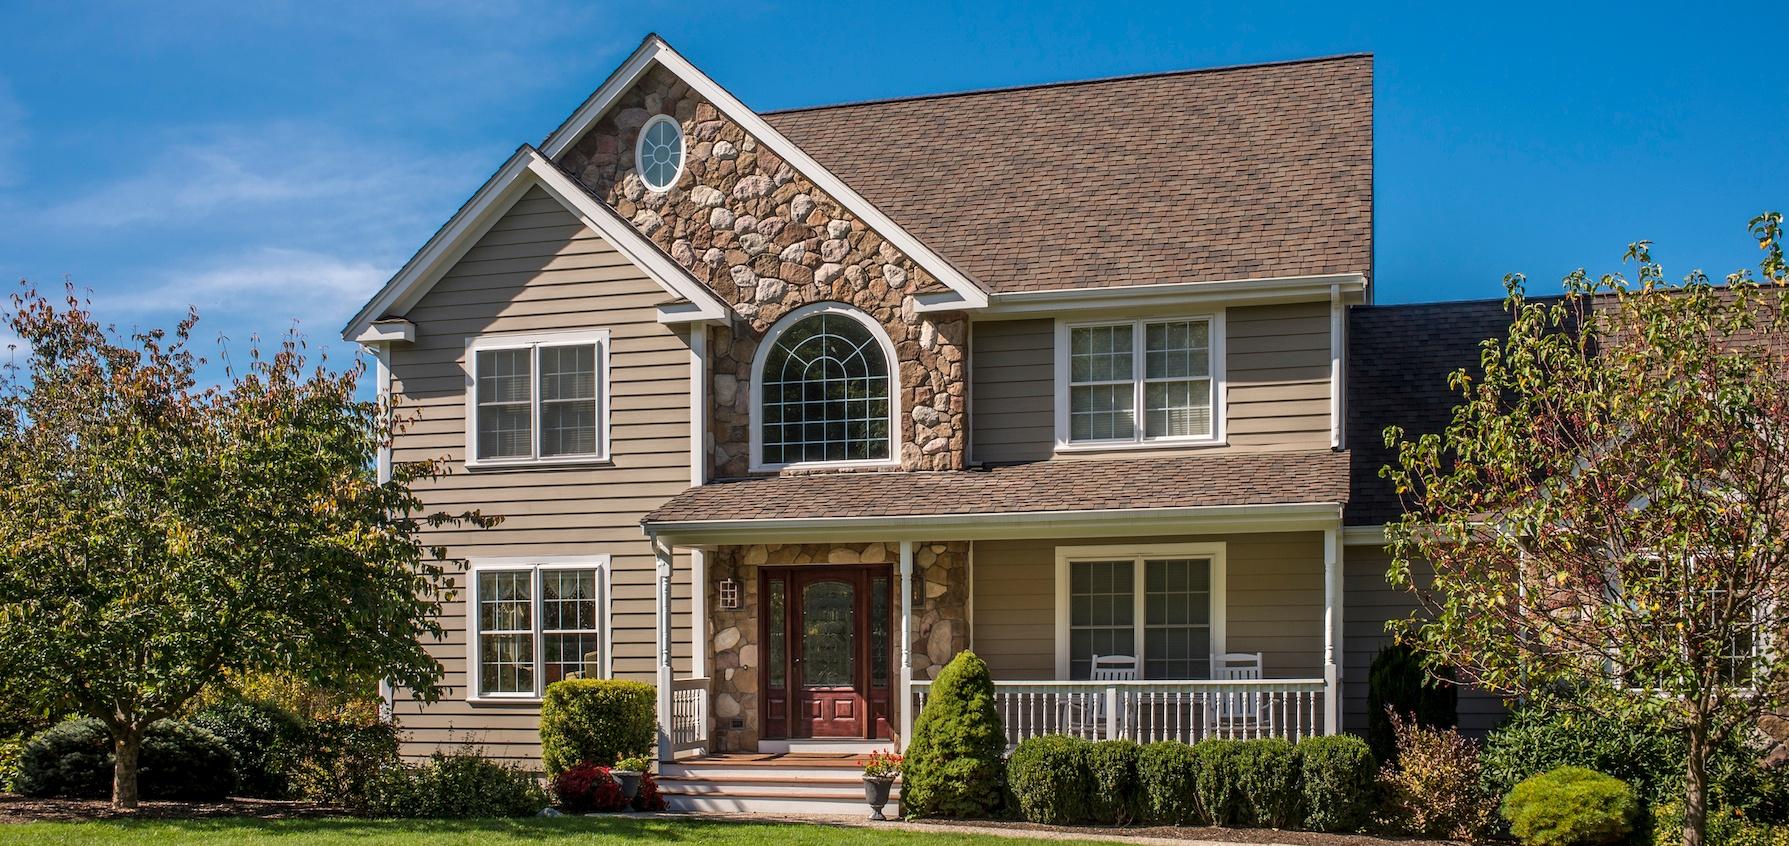 006_131008_Ashland_MA_Residence.jpg